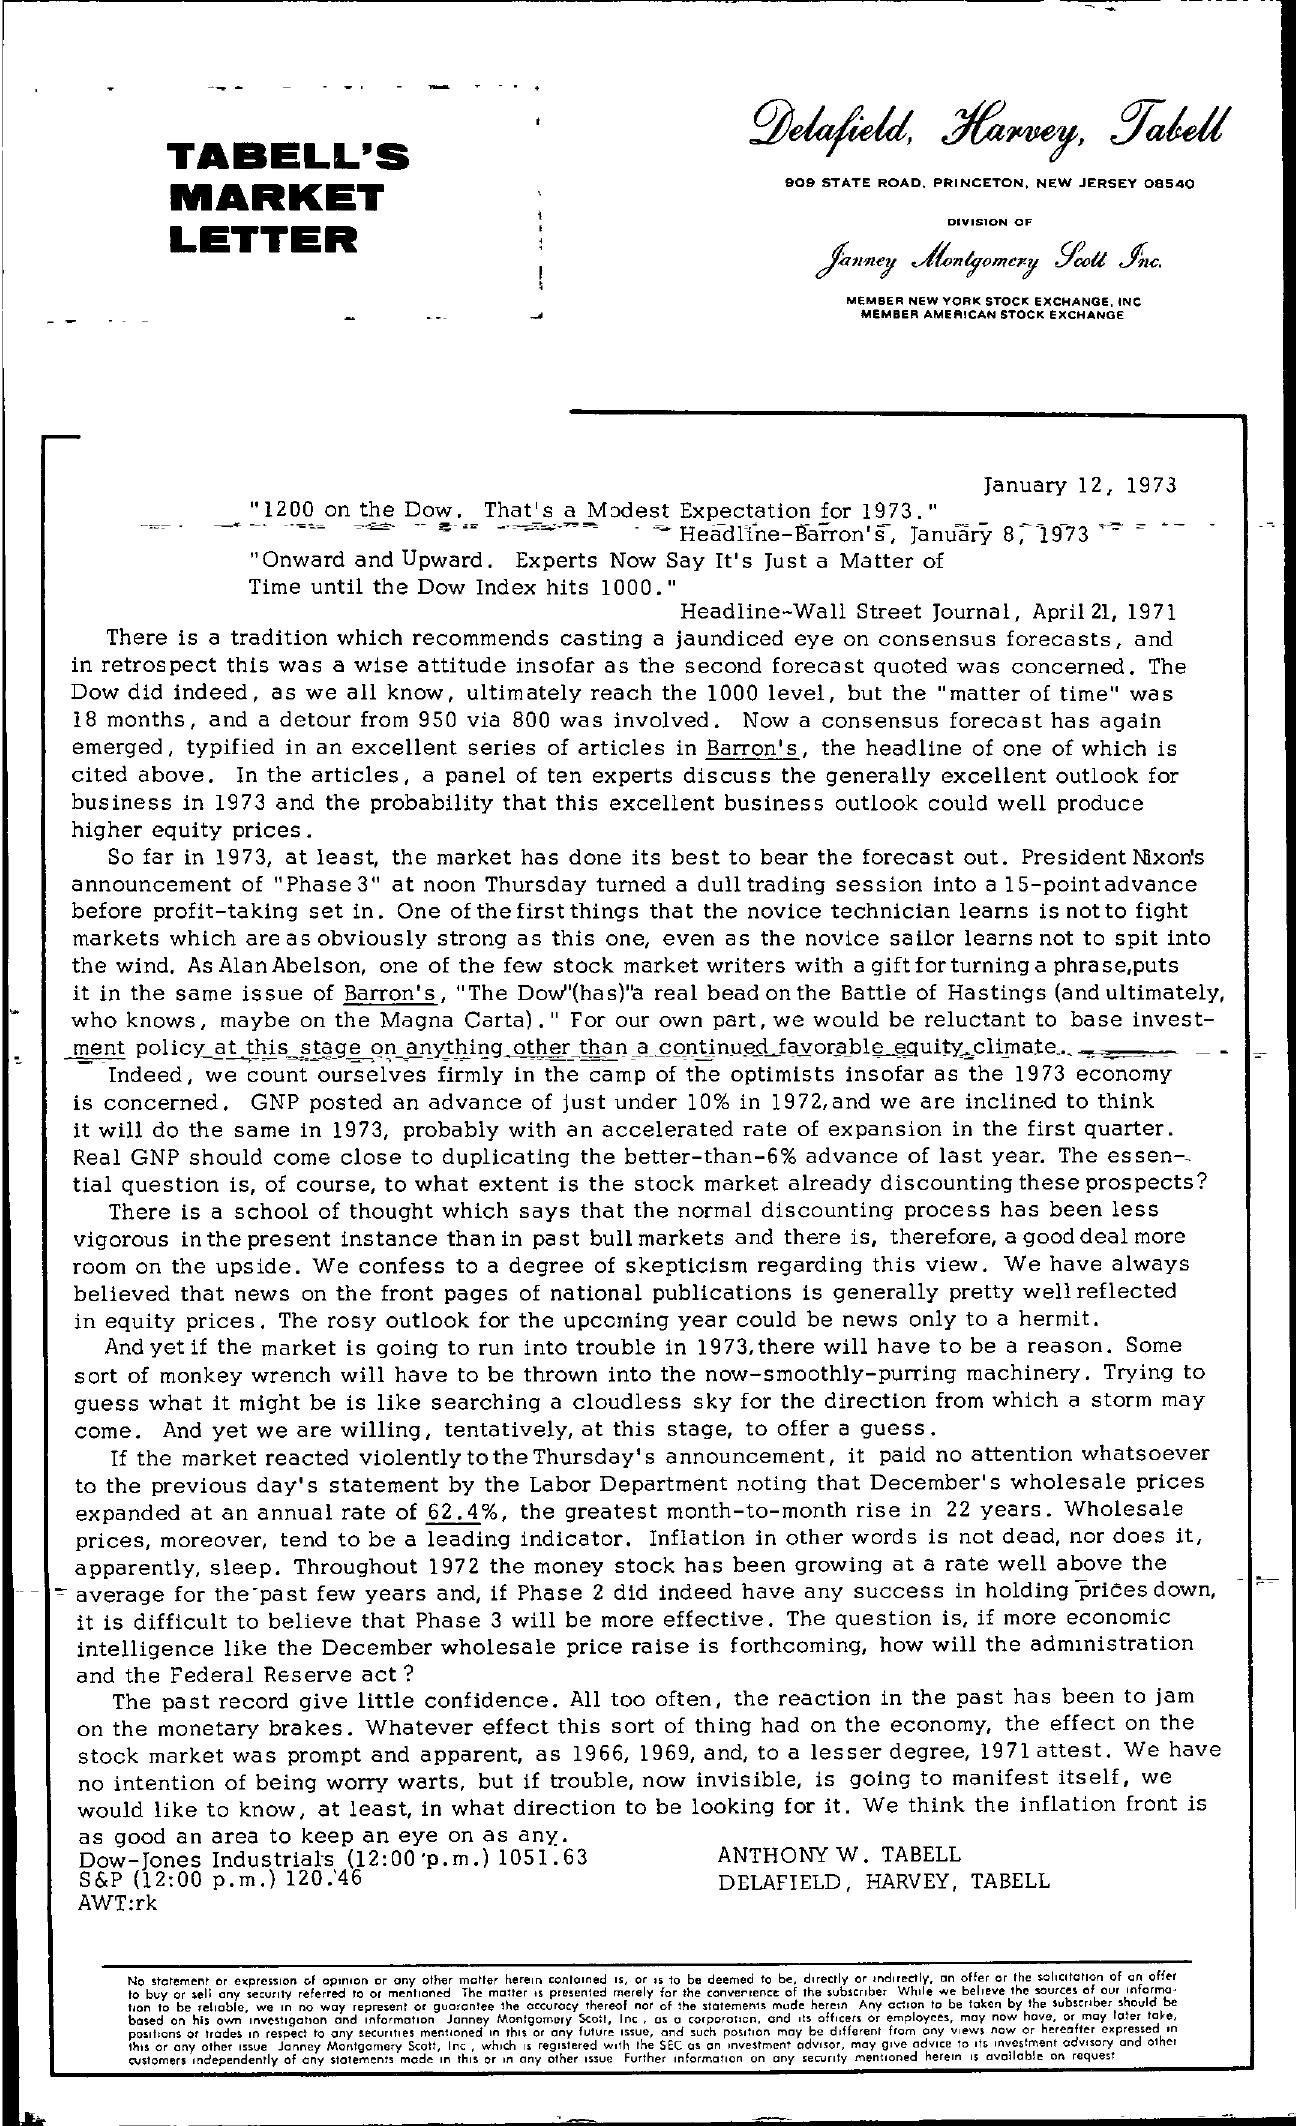 Tabell's Market Letter - January 12, 1973